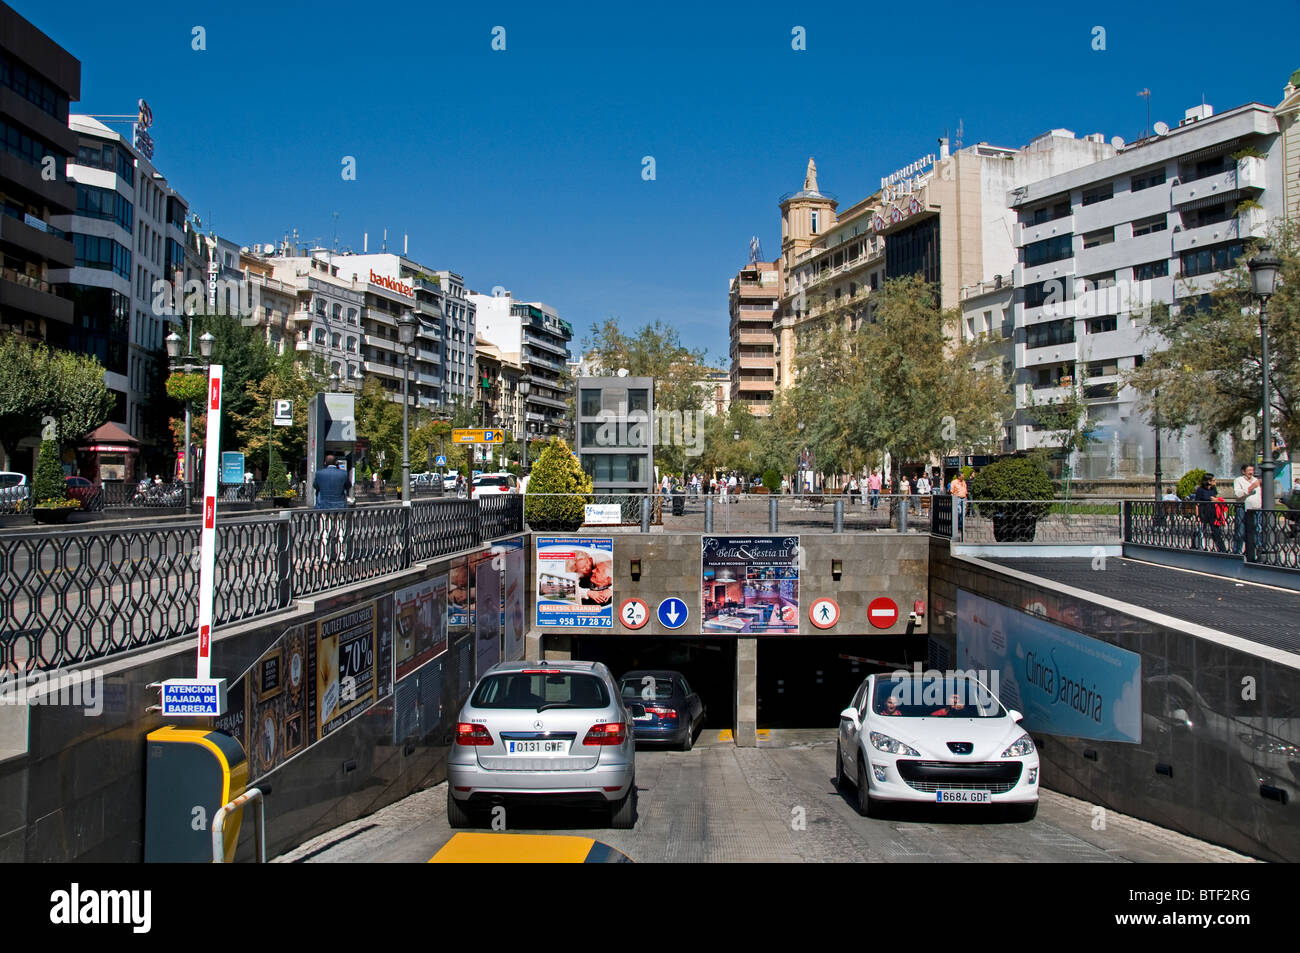 Granada Spain Andalusia underground parking garage - Stock Image